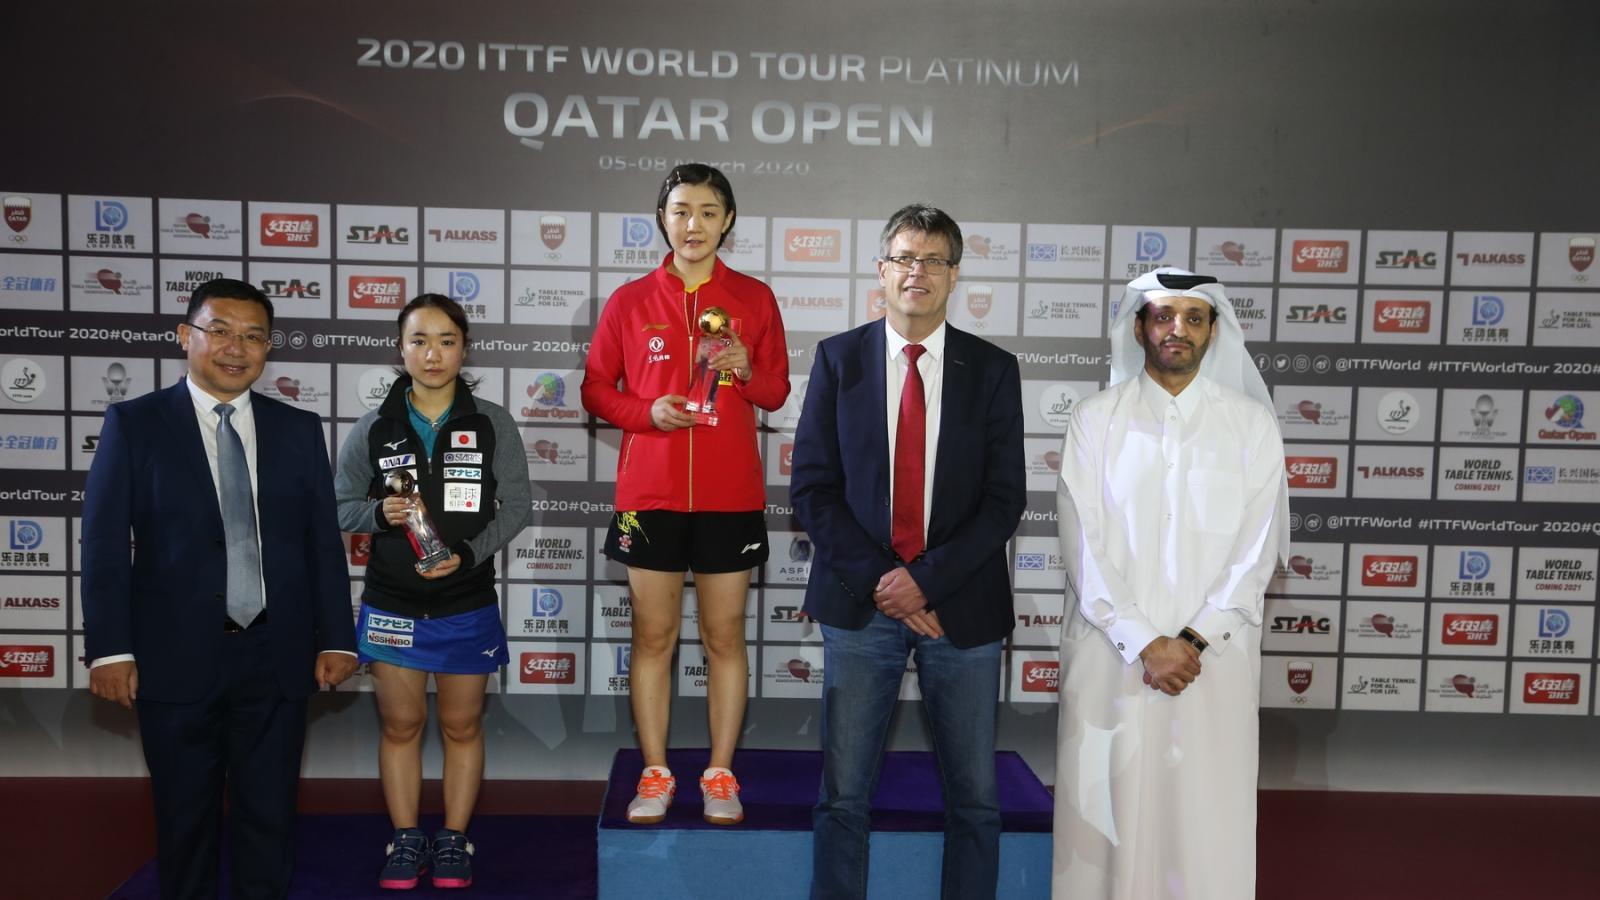 China's Zhendong and Meng triumph at 2020 ITTF World Tour Platinum Qatar Open